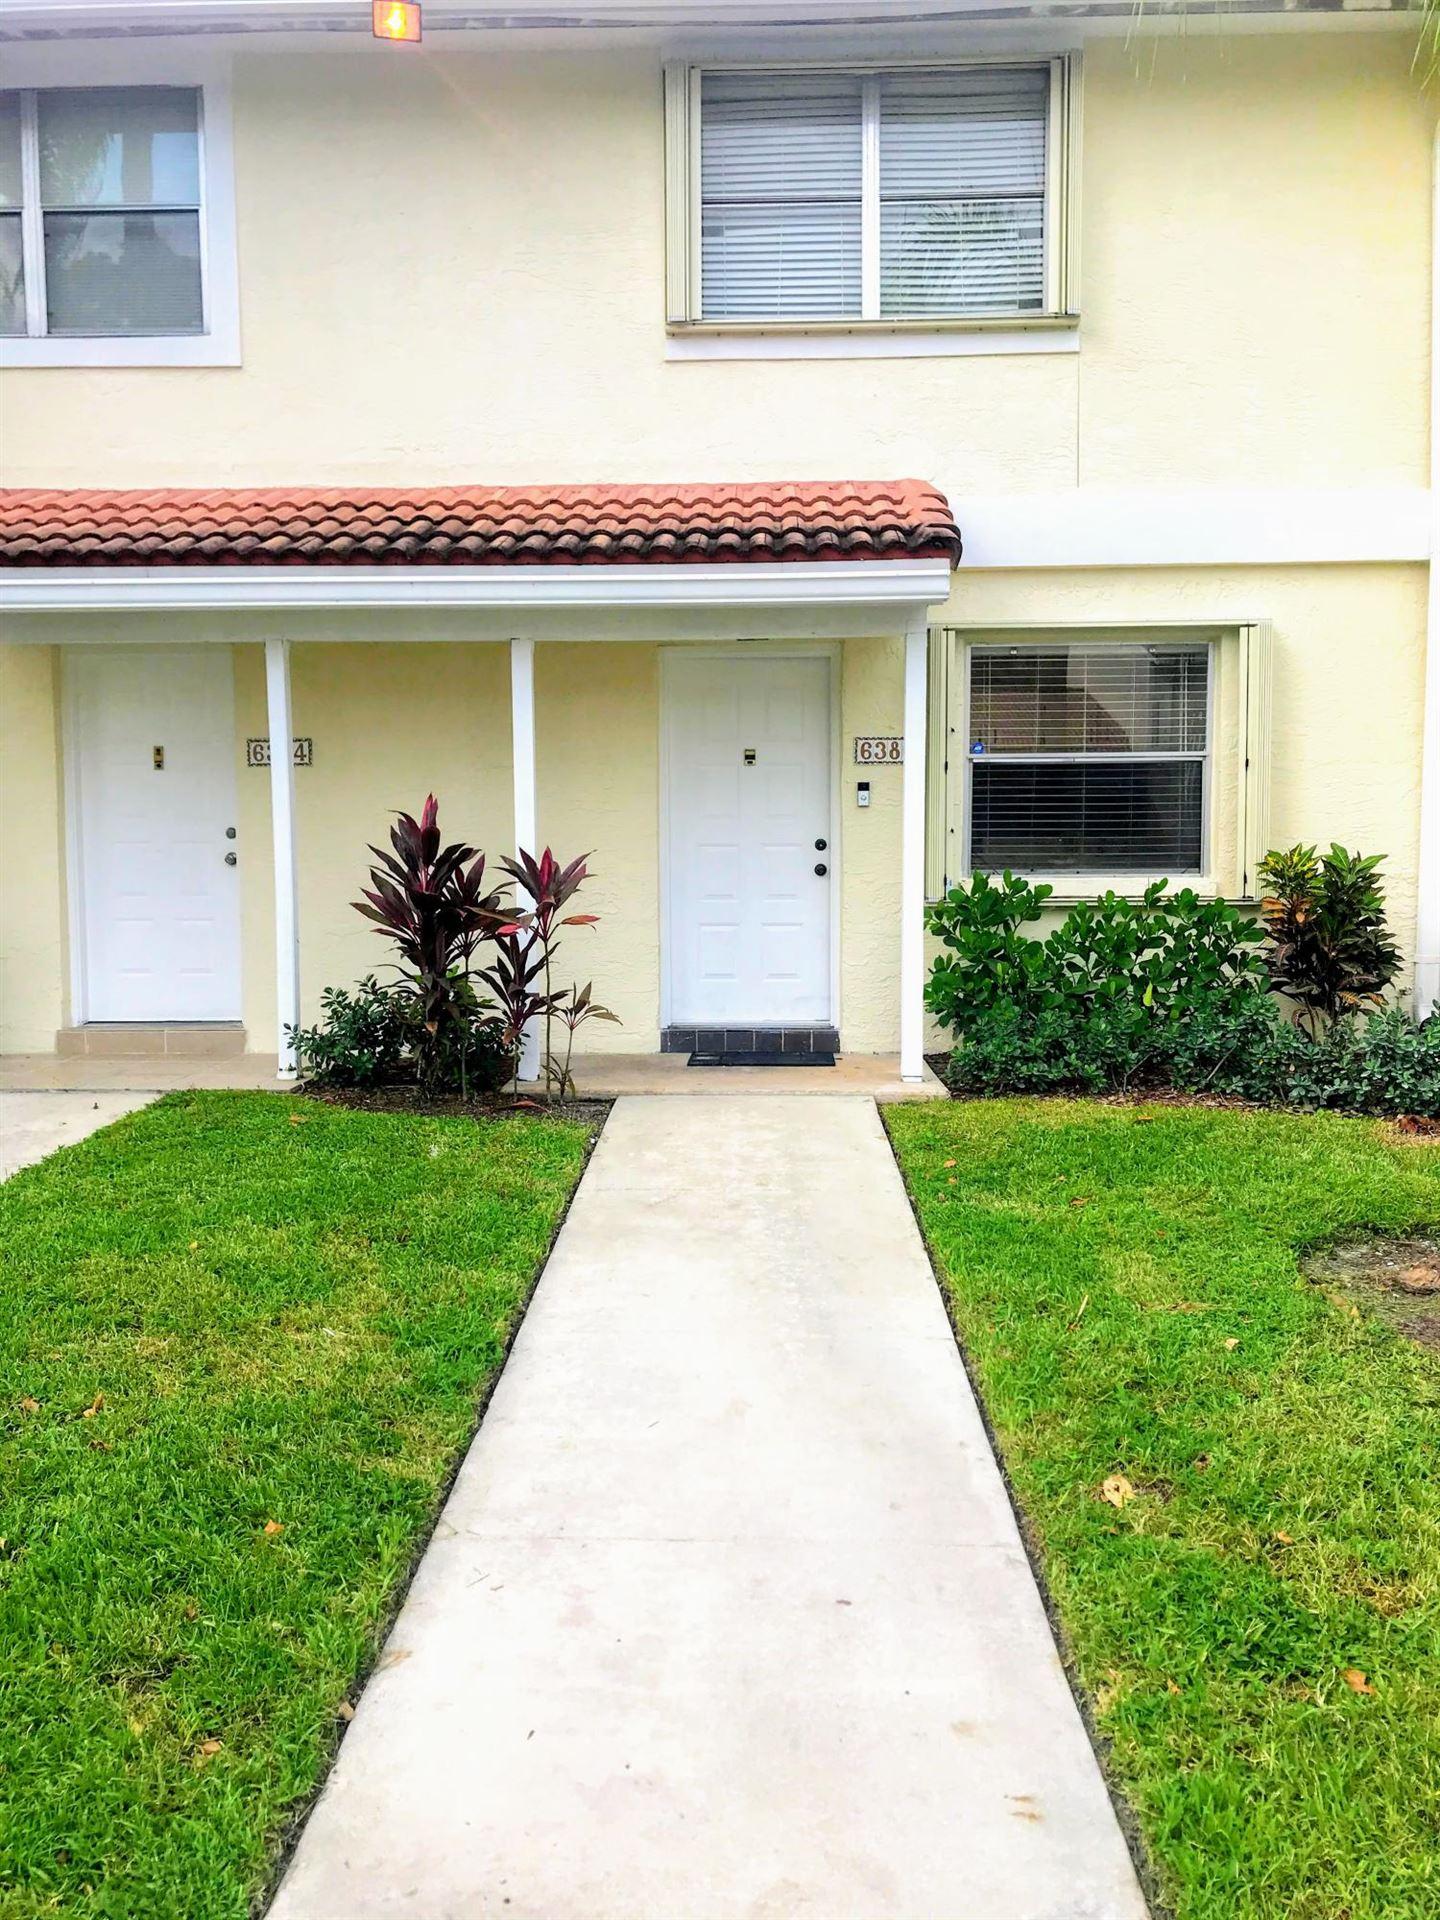 6386 Boca Circle, Boca Raton, FL 33433 - #: RX-10659489